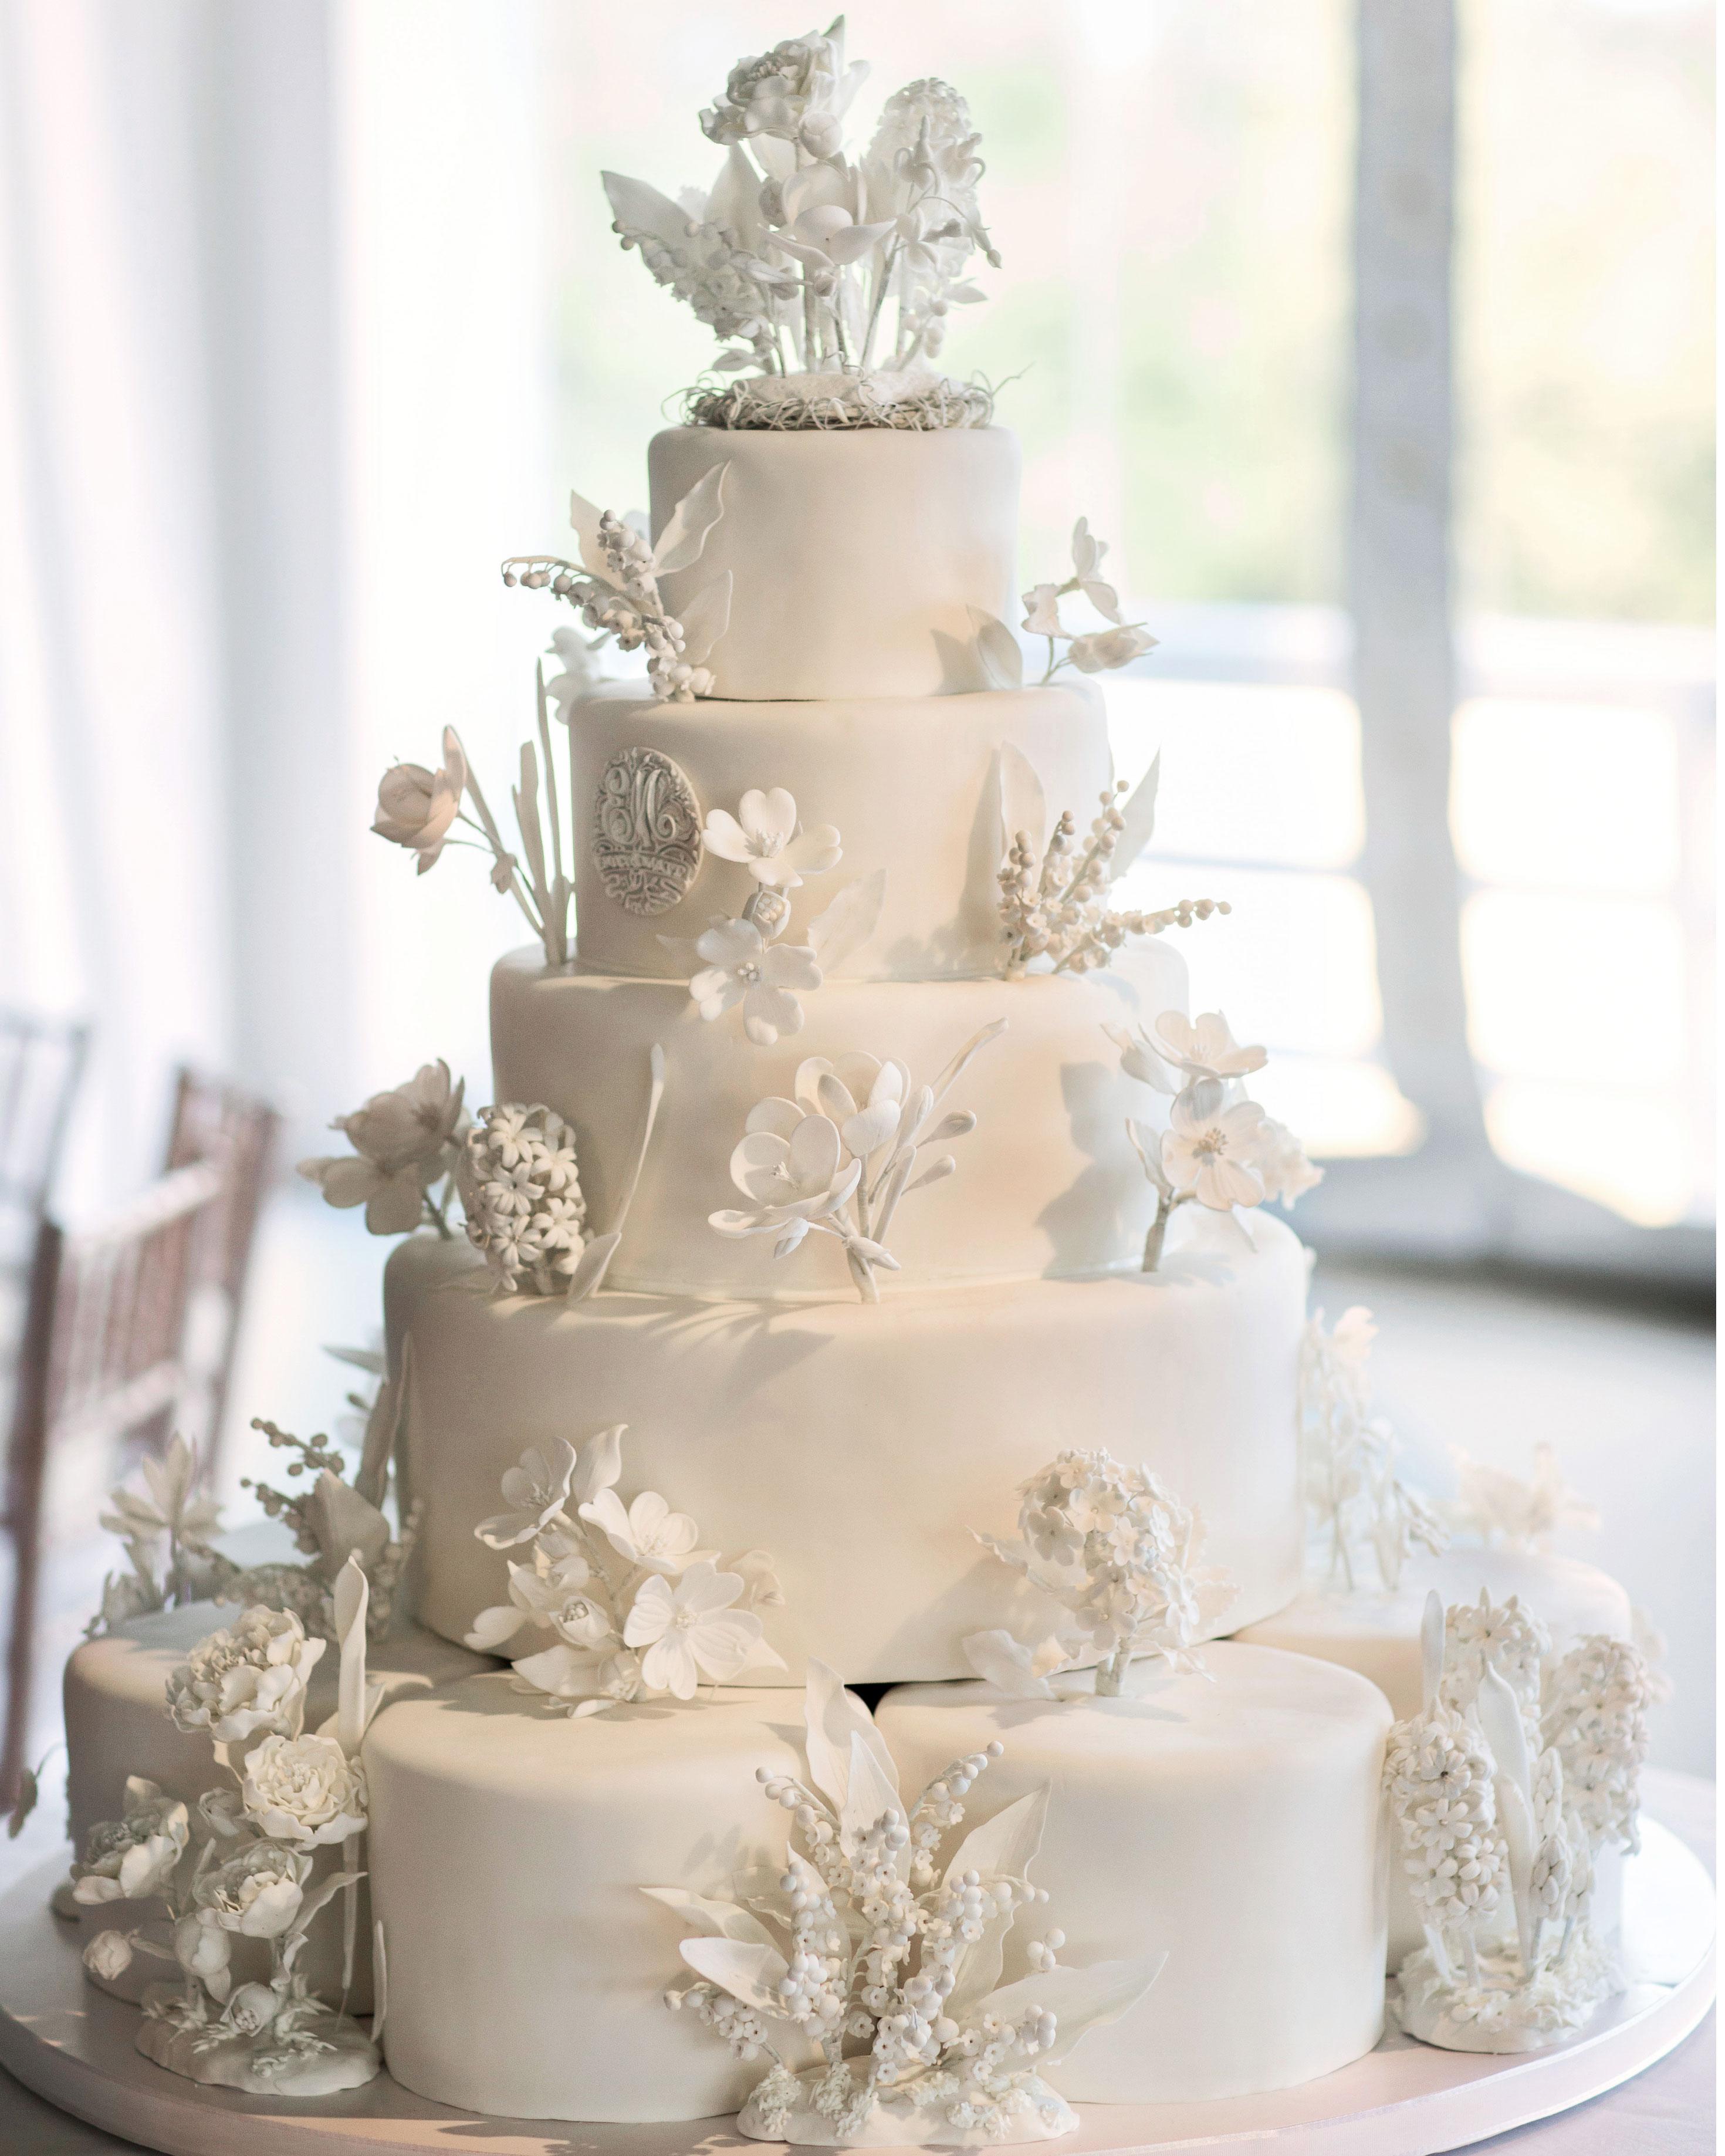 emily-matthew-wedding-cake-0124-s112720-0316.jpg